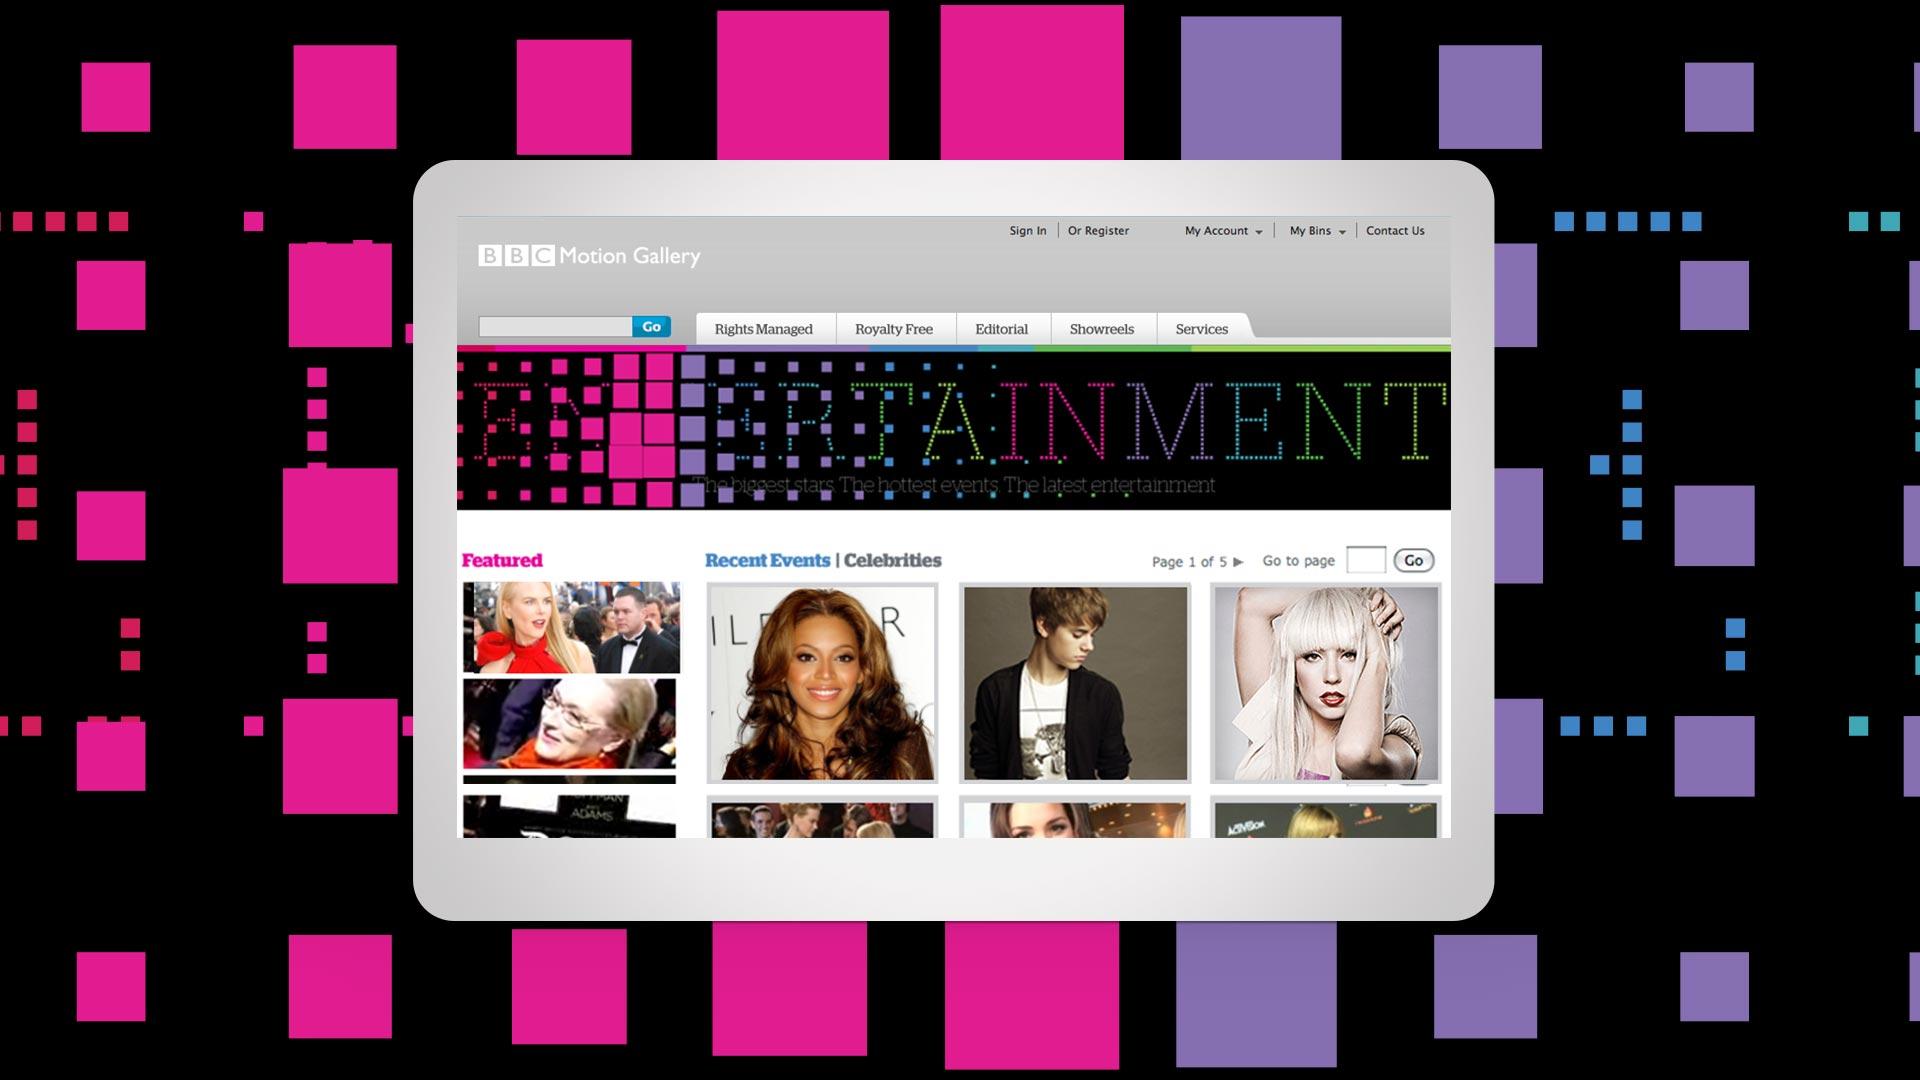 00A_CaseStudy_BBC_v01_be_4.jpg